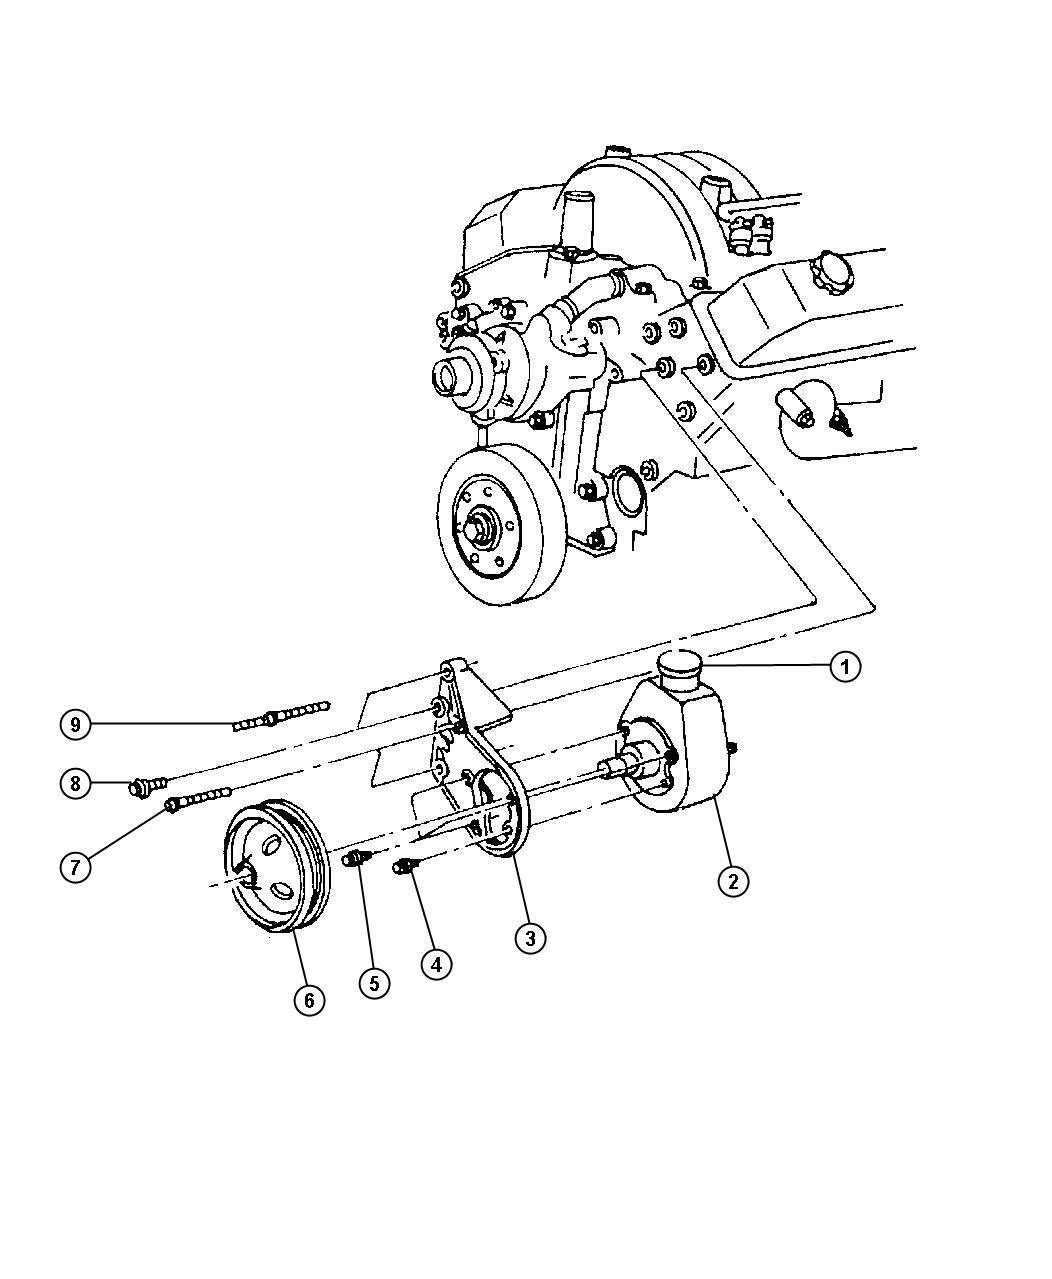 Dodge Dakota Pump Power Steering New Part For Core